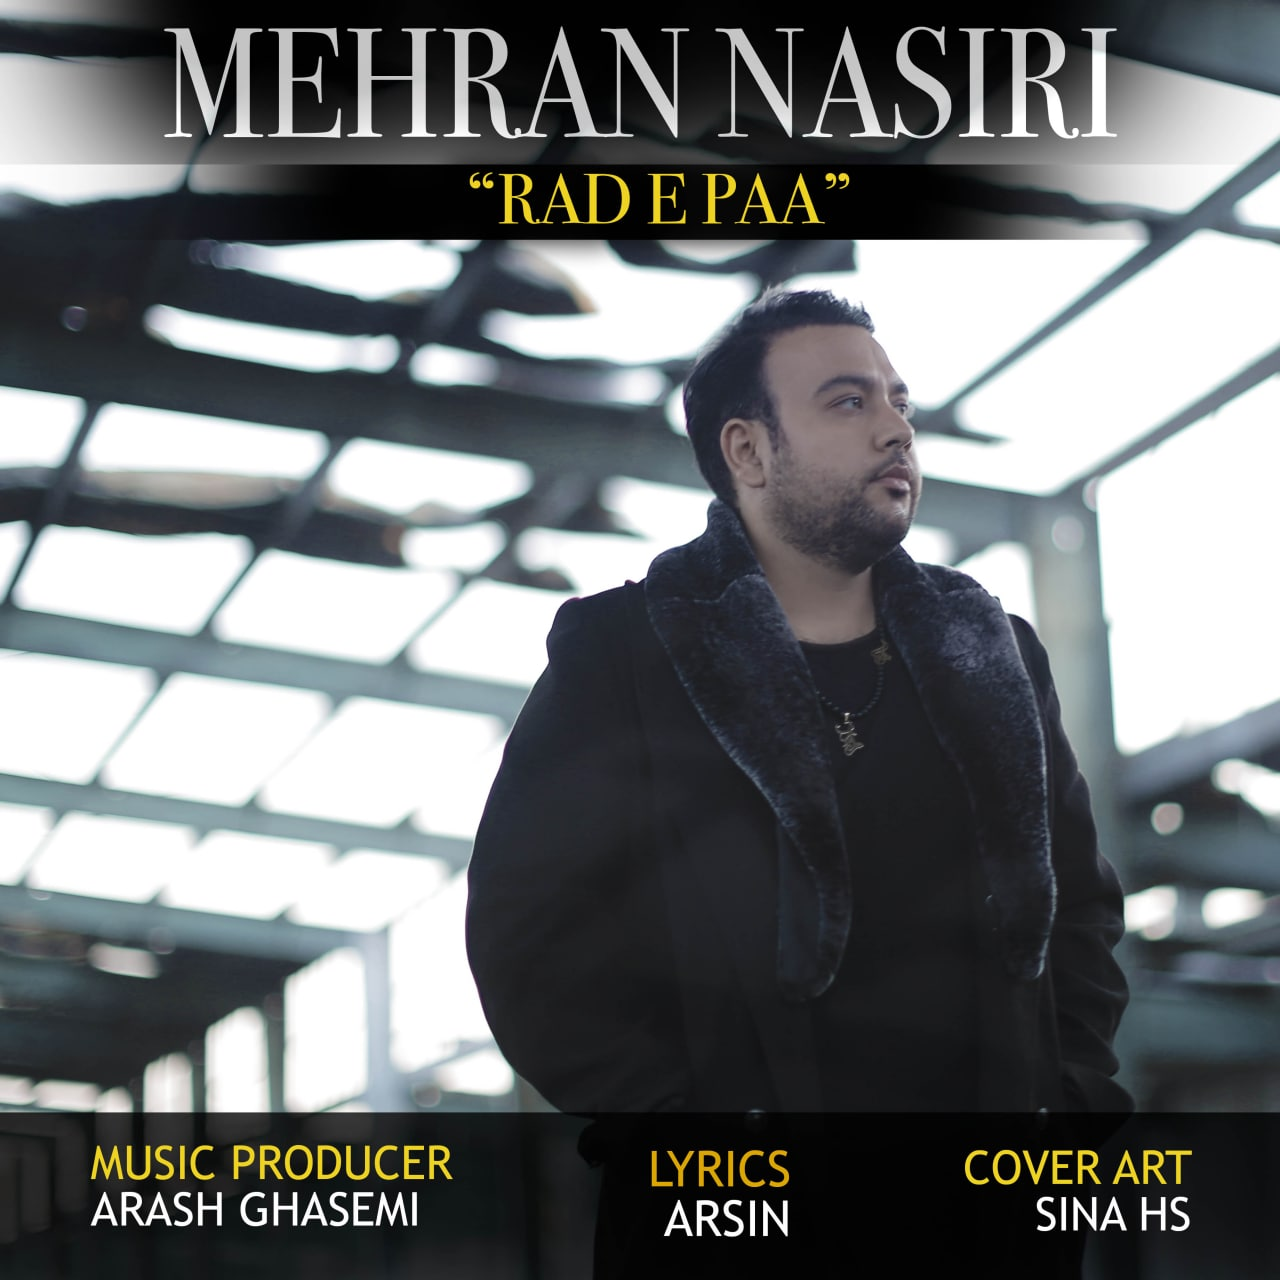 Mehran Nasiri – Rade Paa